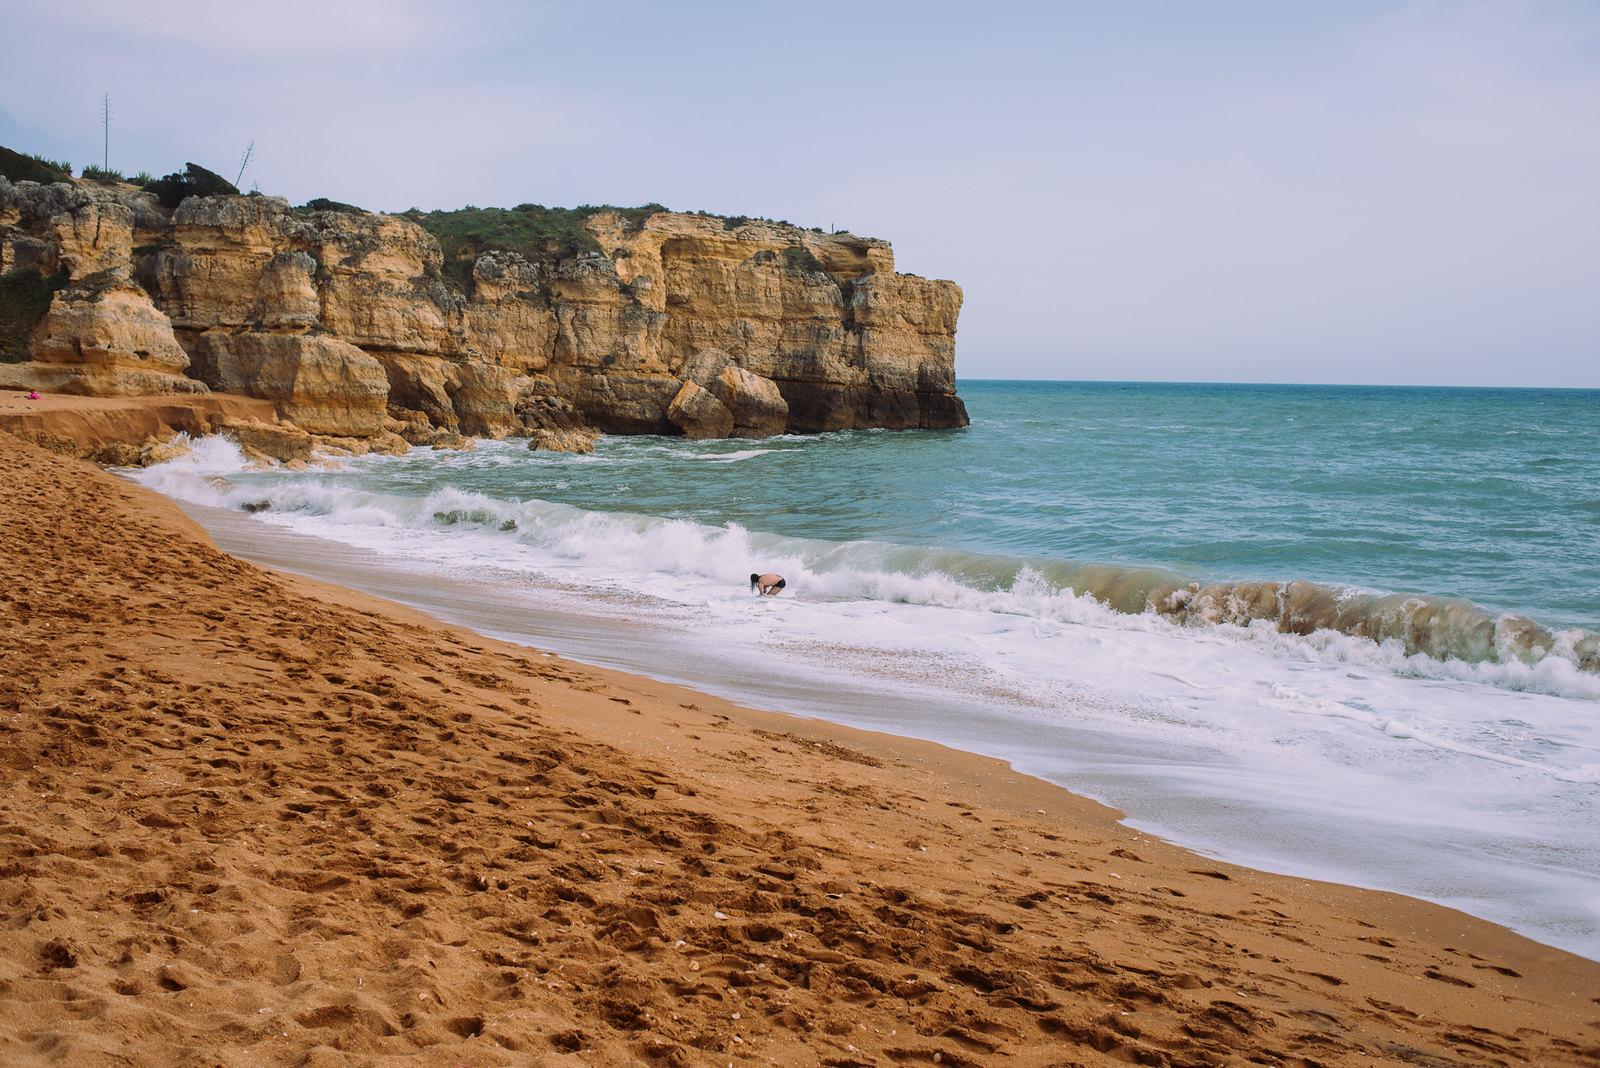 Praia da Coelha strand Algarve-ban